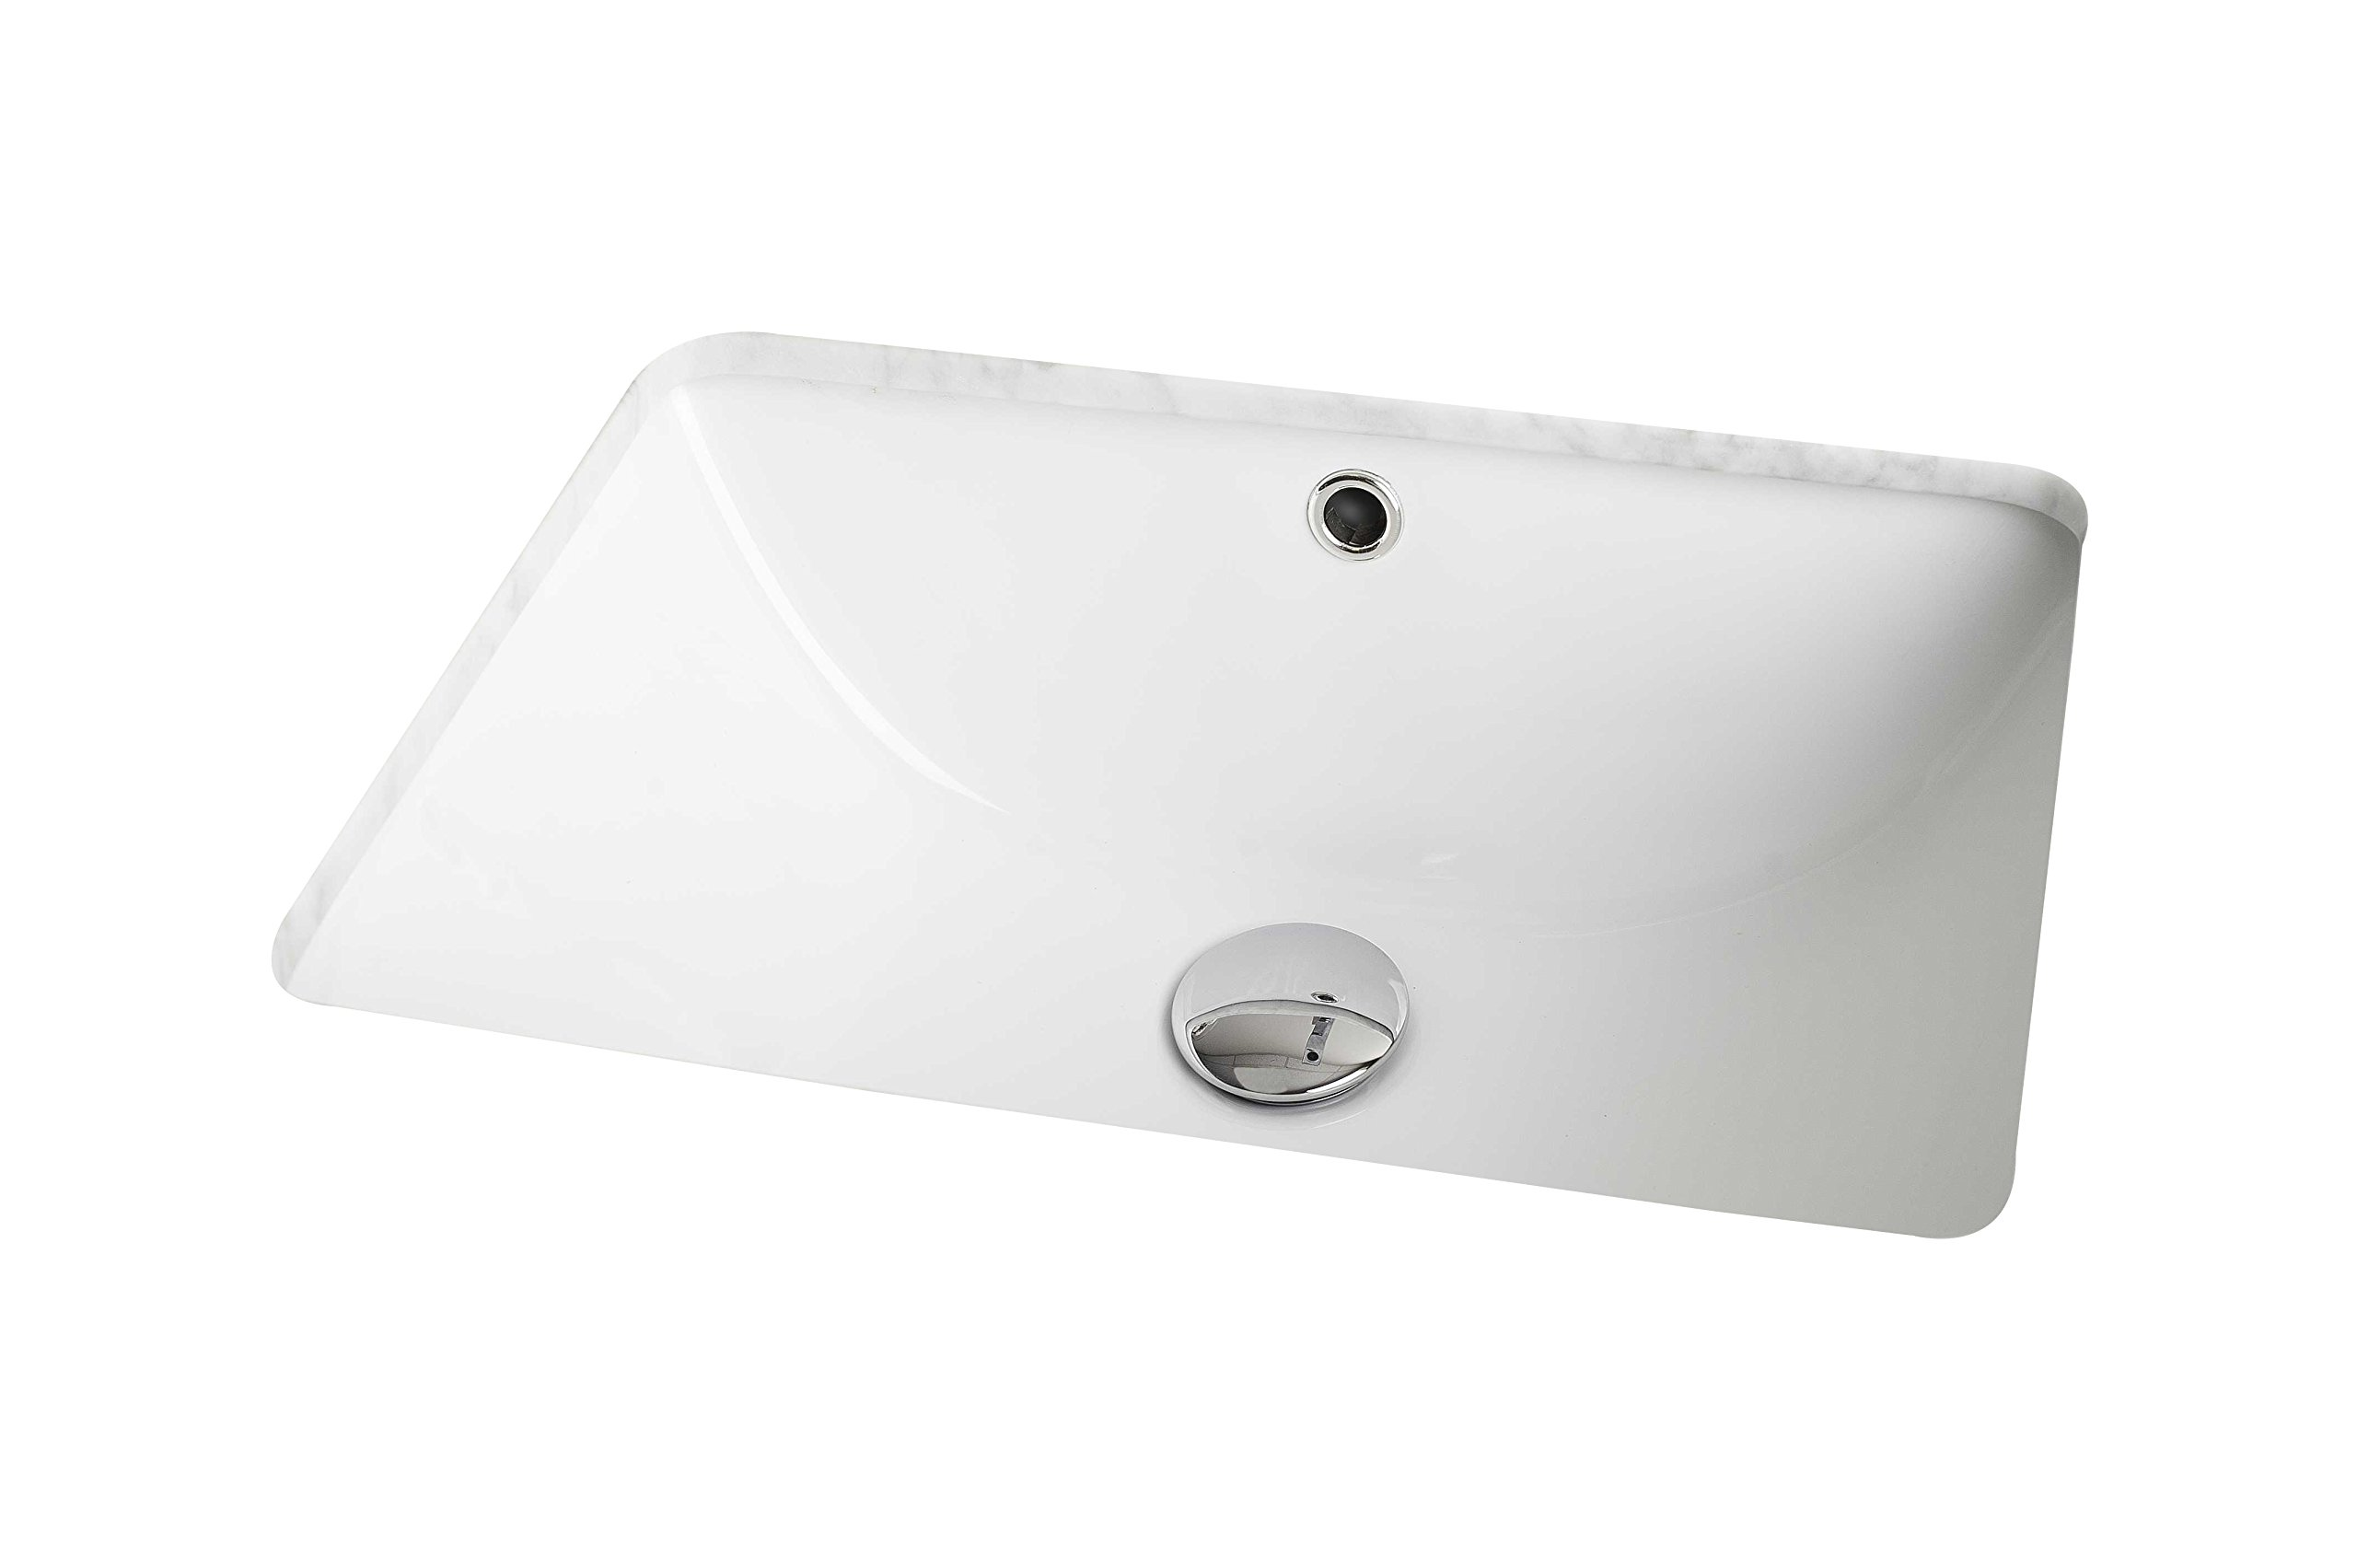 Jade Bath JB-536 18.25'' W x 13.75'' D CUPC Certified Rectangle Undermount Sink, White